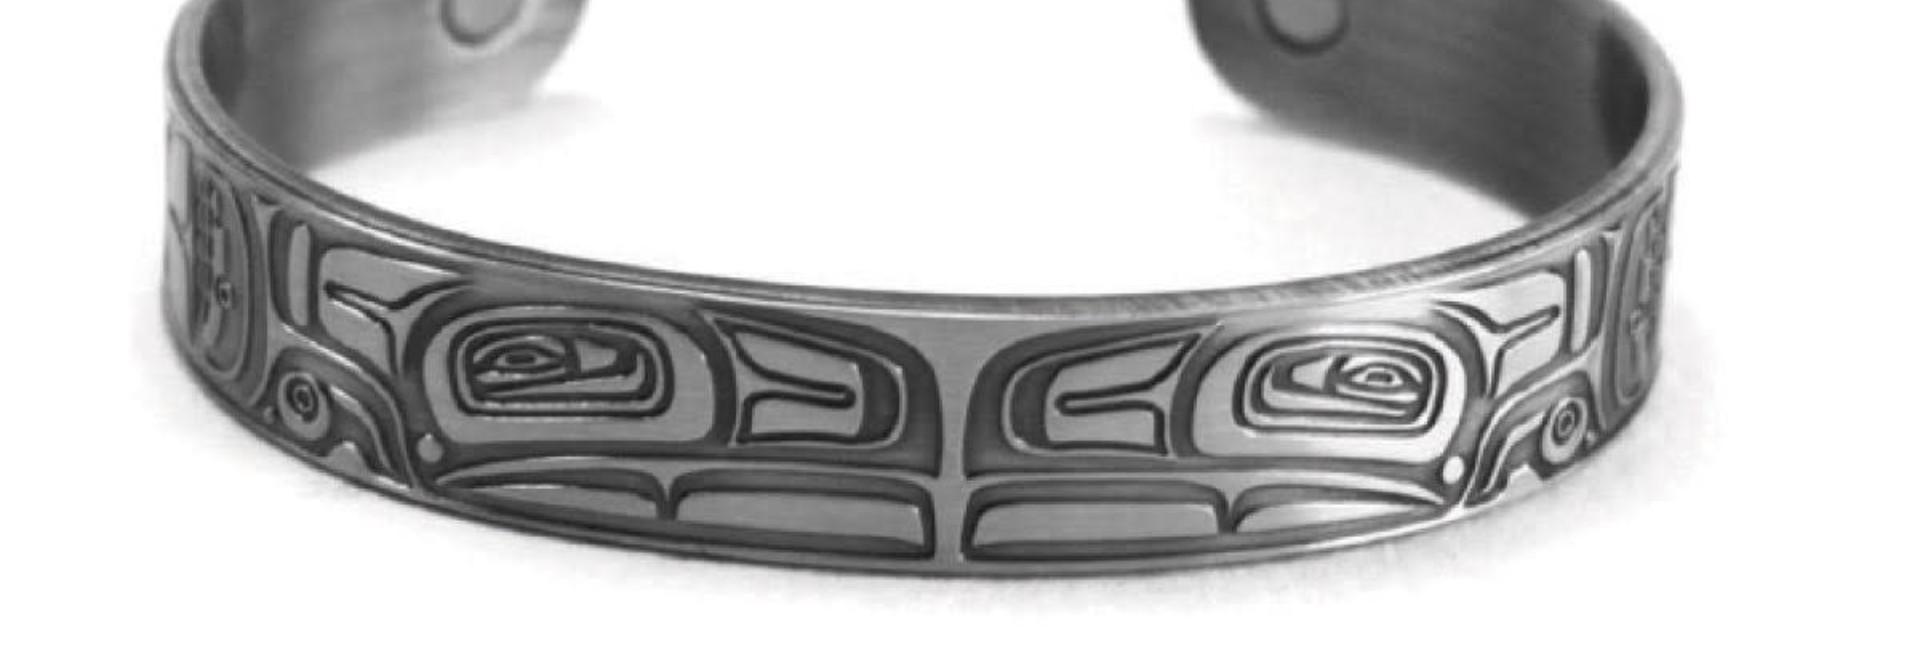 Brushed Silver Bracelet -Thunderbird by Morgan Asoyuf